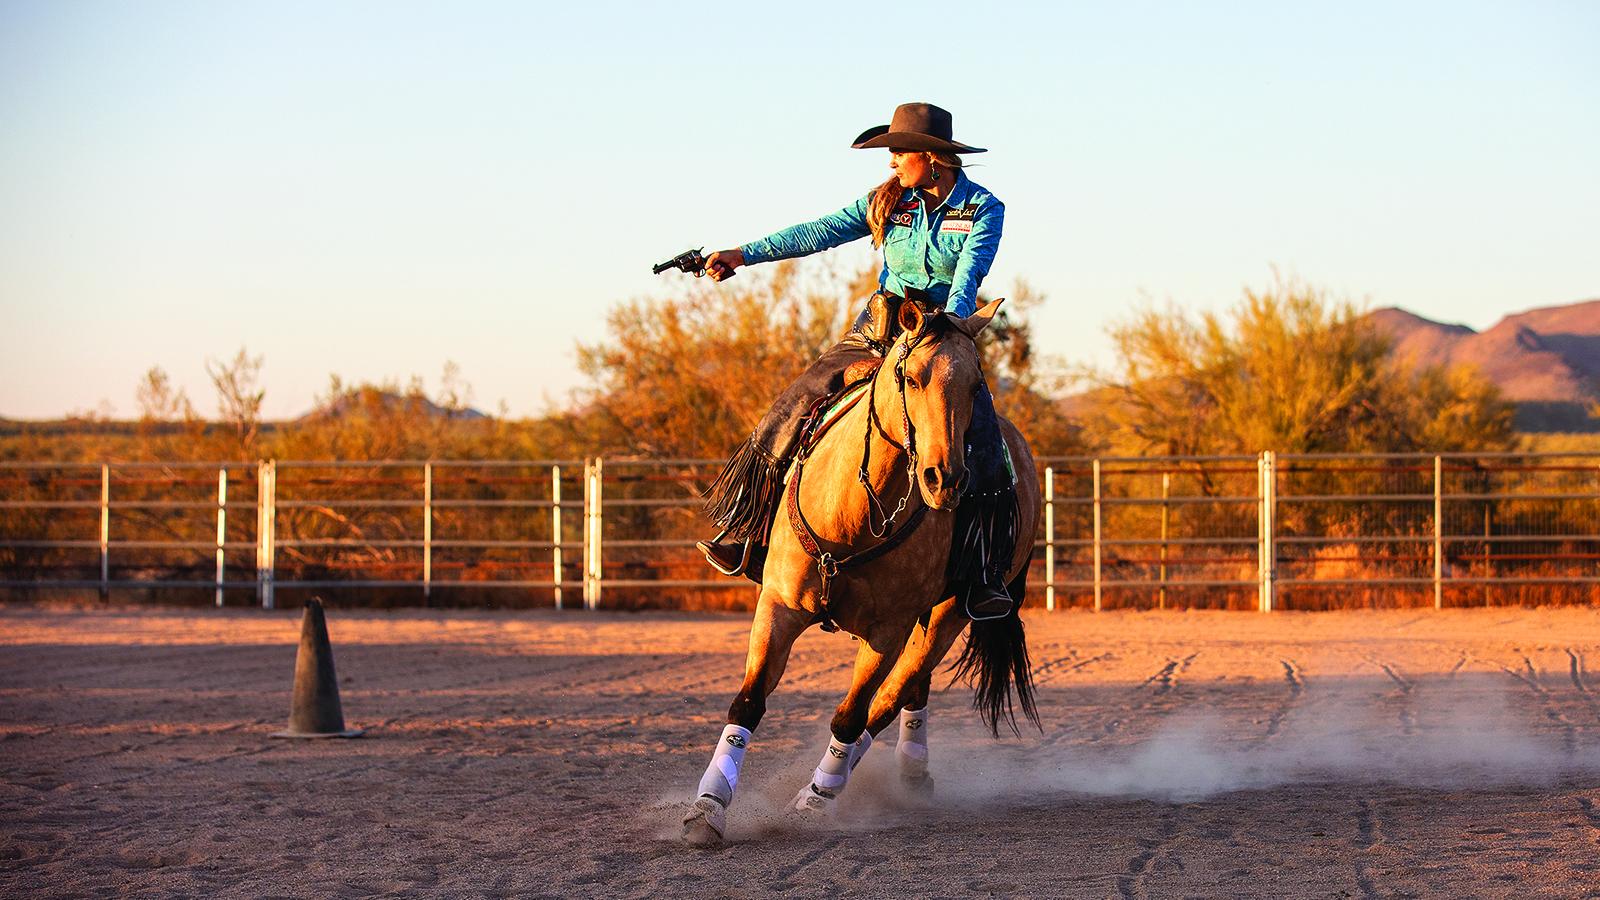 Kenda Lenseigne trains mounted shooting horses